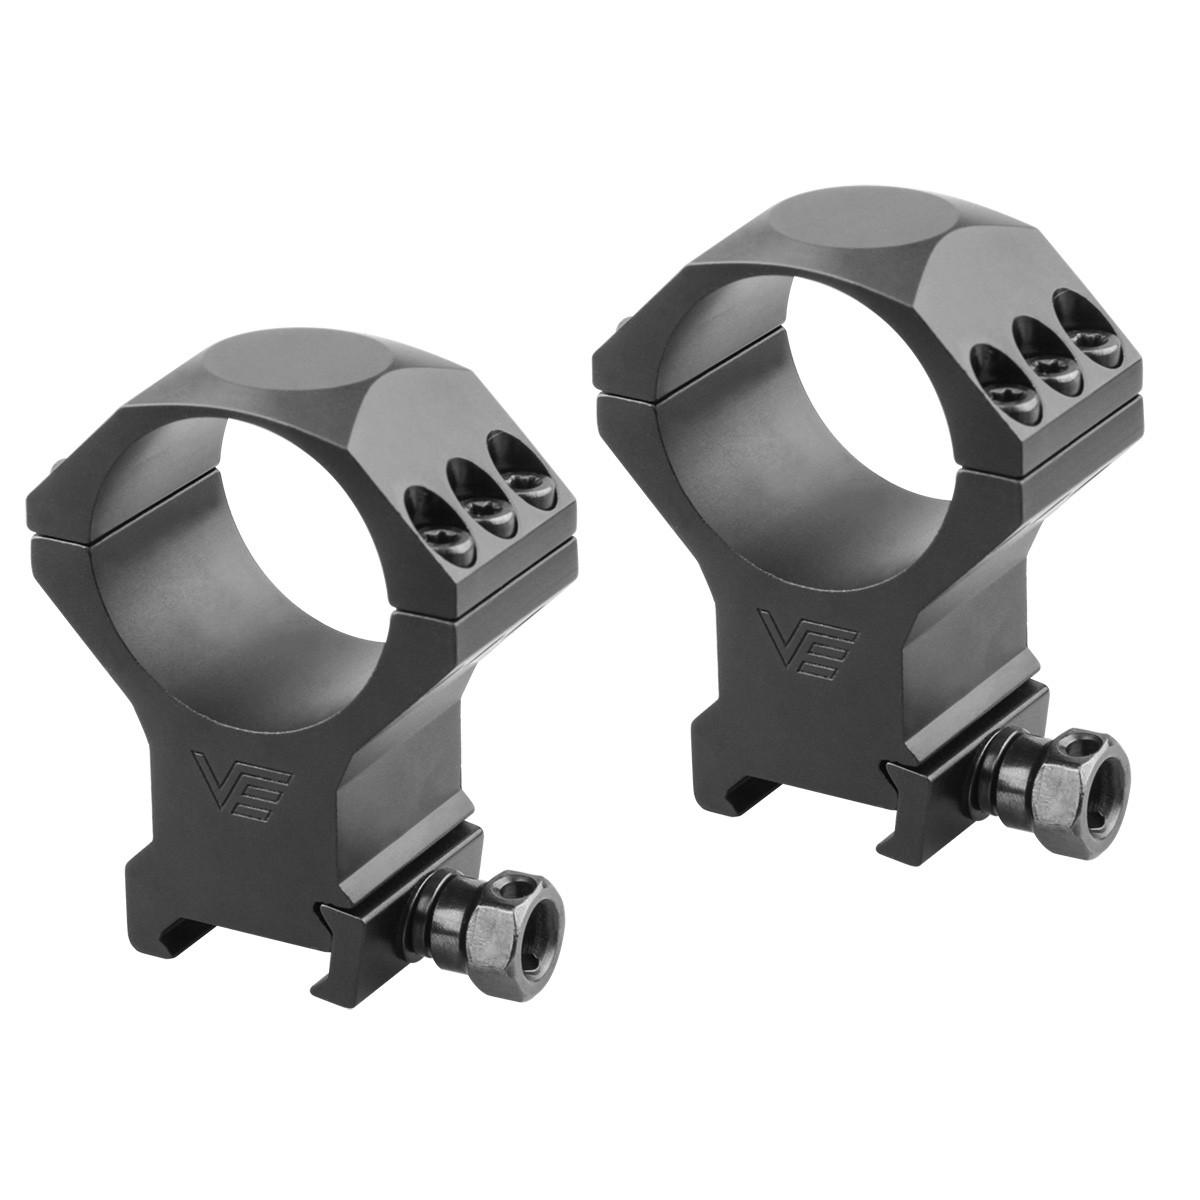 34mm Continental 5-30x56FFP Riflescope